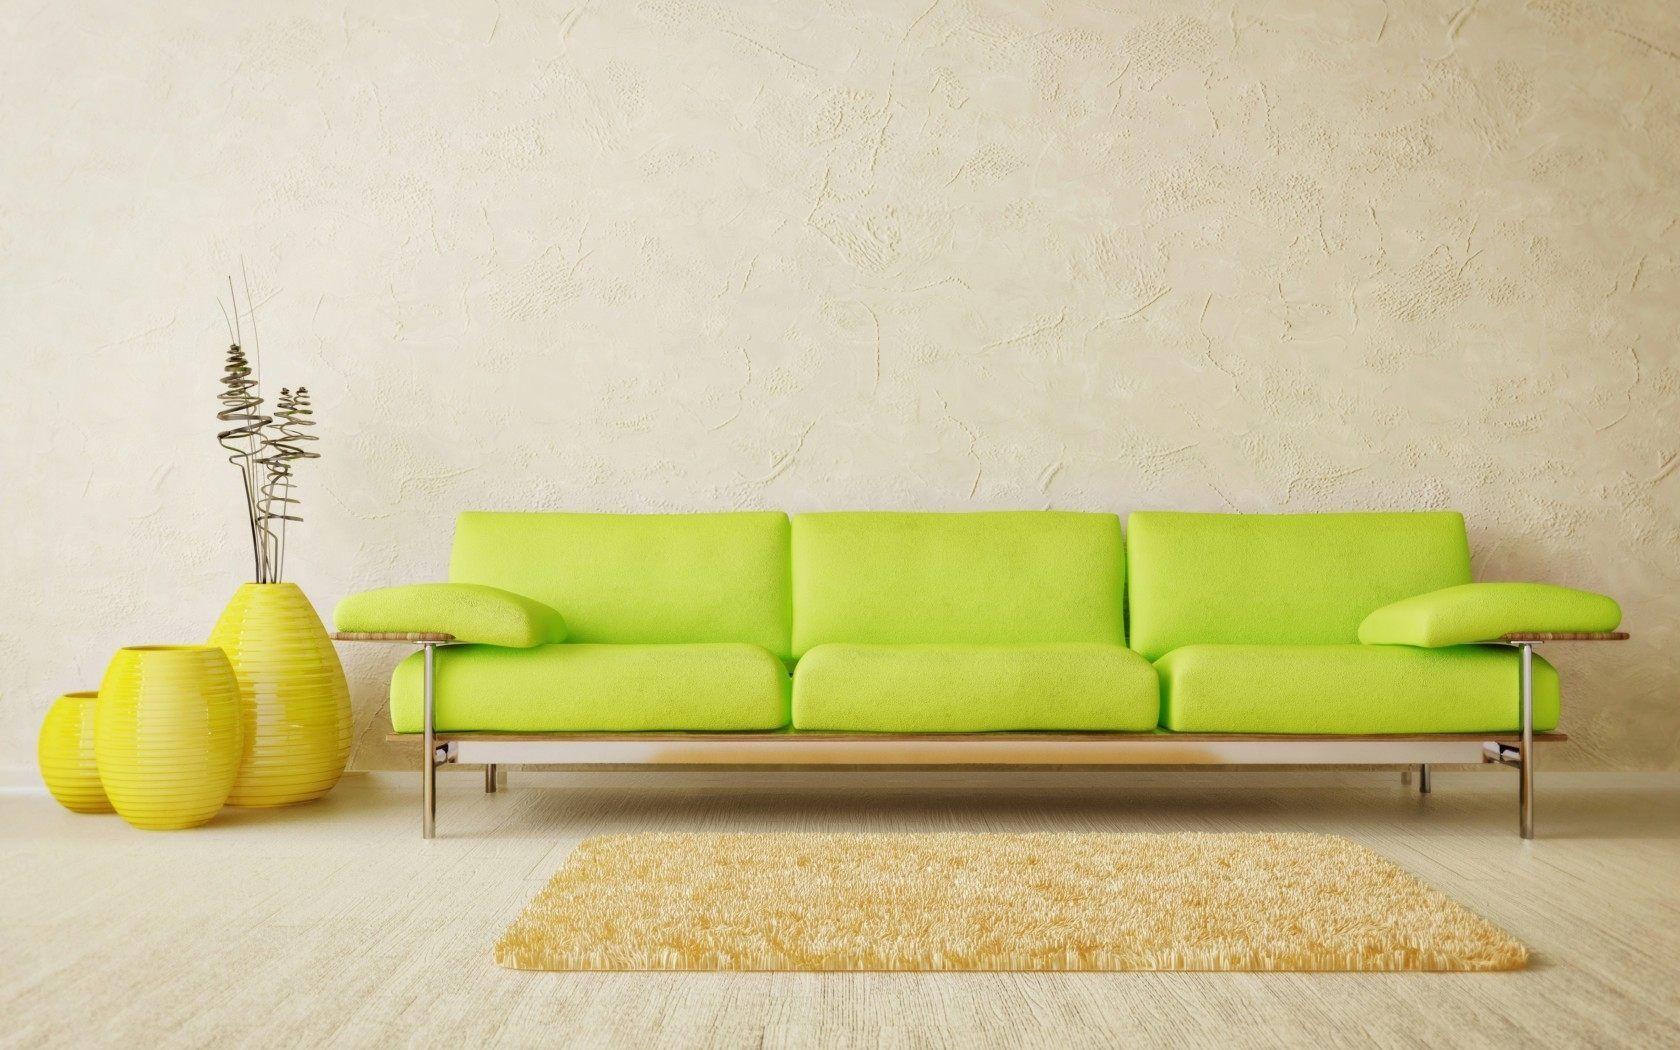 Интерьер, комната, стиль, дизайн, светлый, минимализм ...